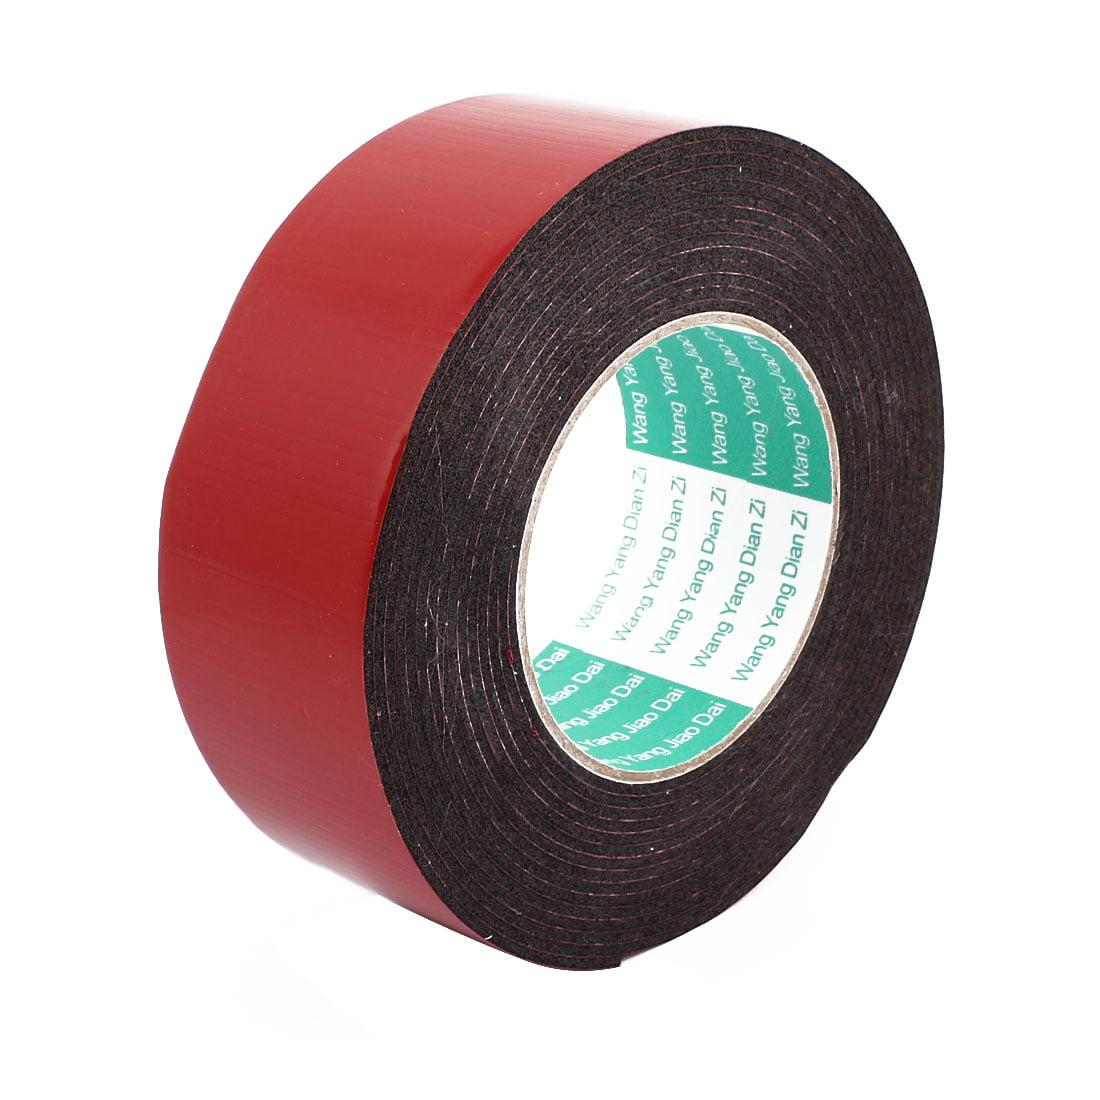 50mm x 2mm Car Self Adhesive Shock Resistant Foam Tape Red 5 Meters Length